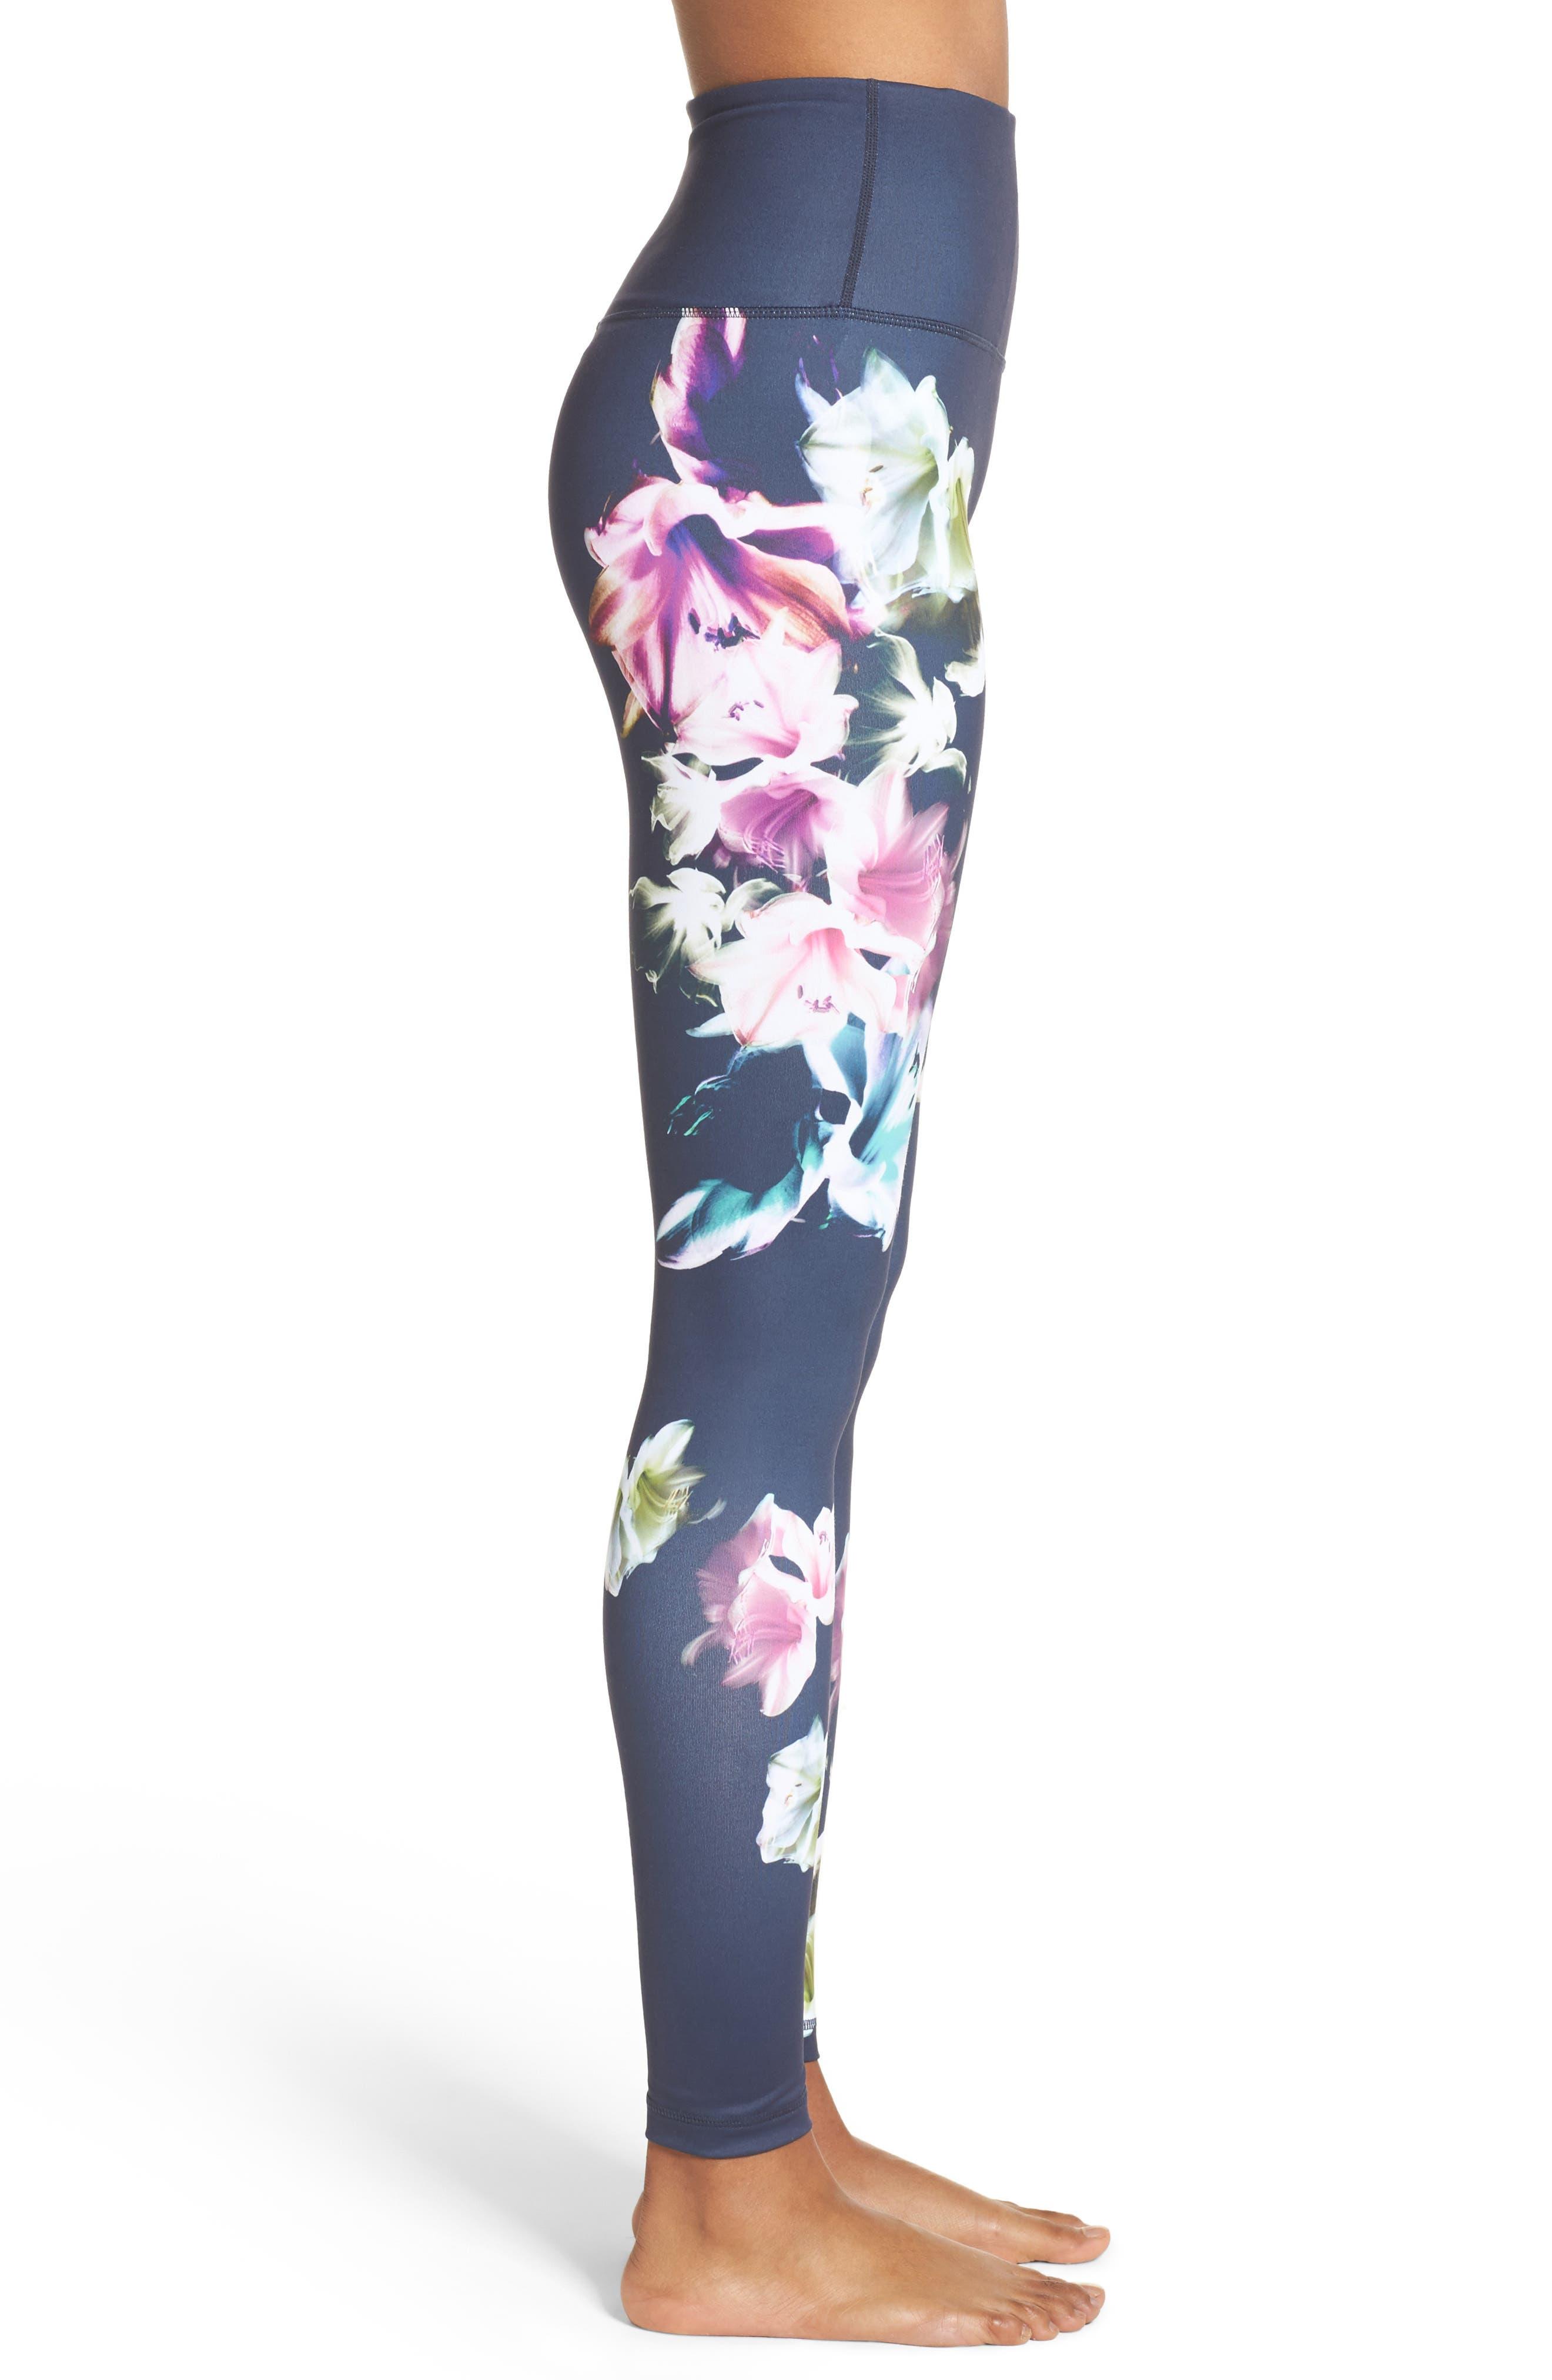 Pure Floral Ink High Waist Leggings,                             Alternate thumbnail 3, color,                             021